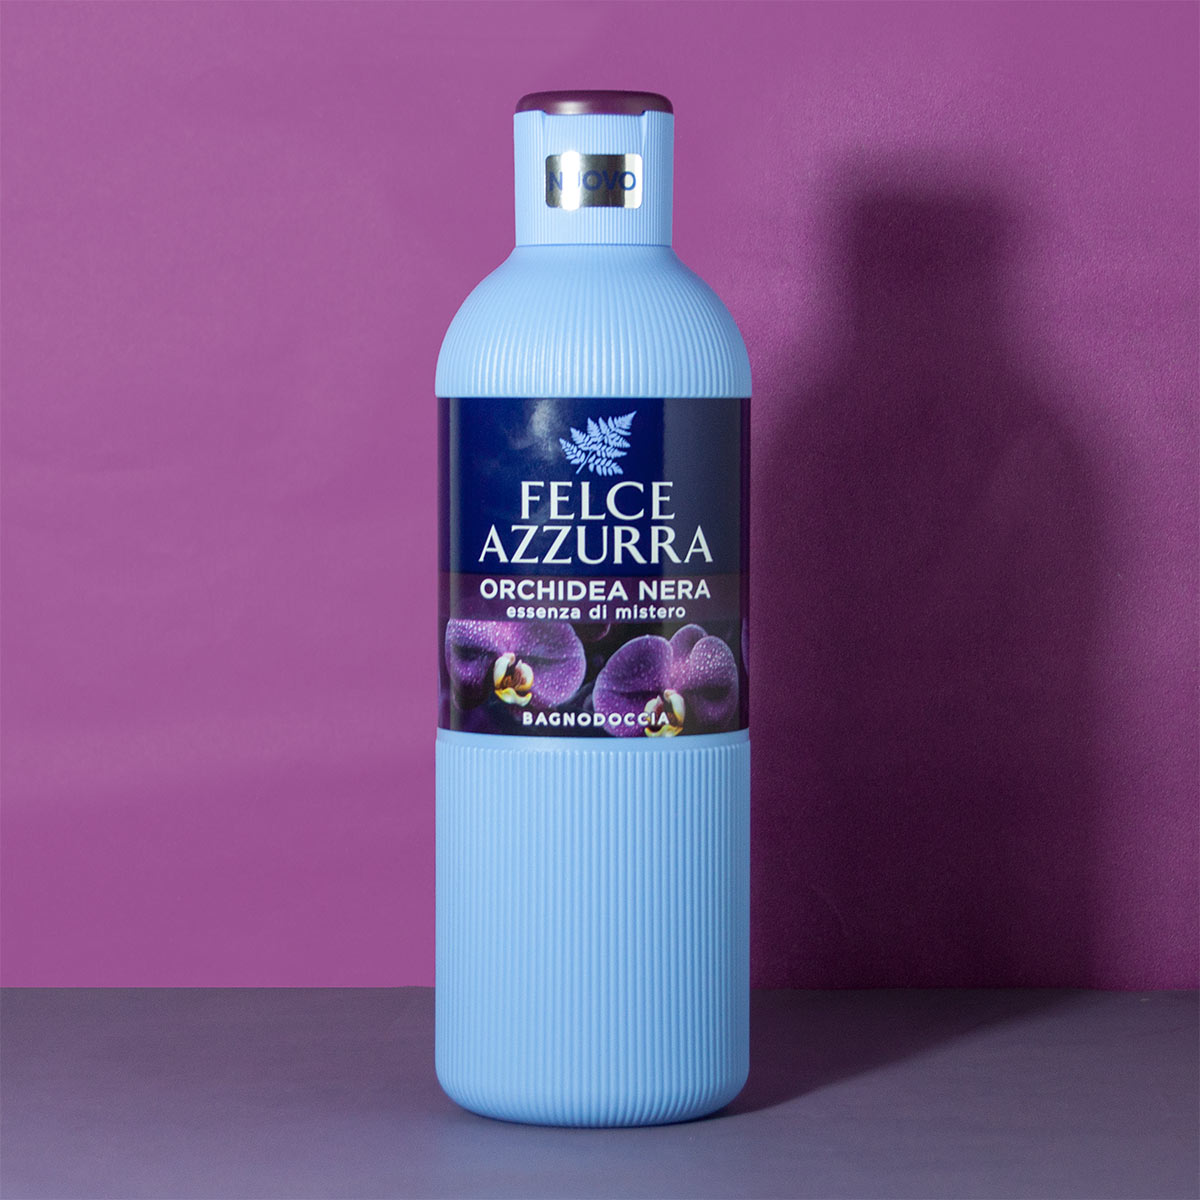 Felce Azzurra Duschbad Orchidea Nera